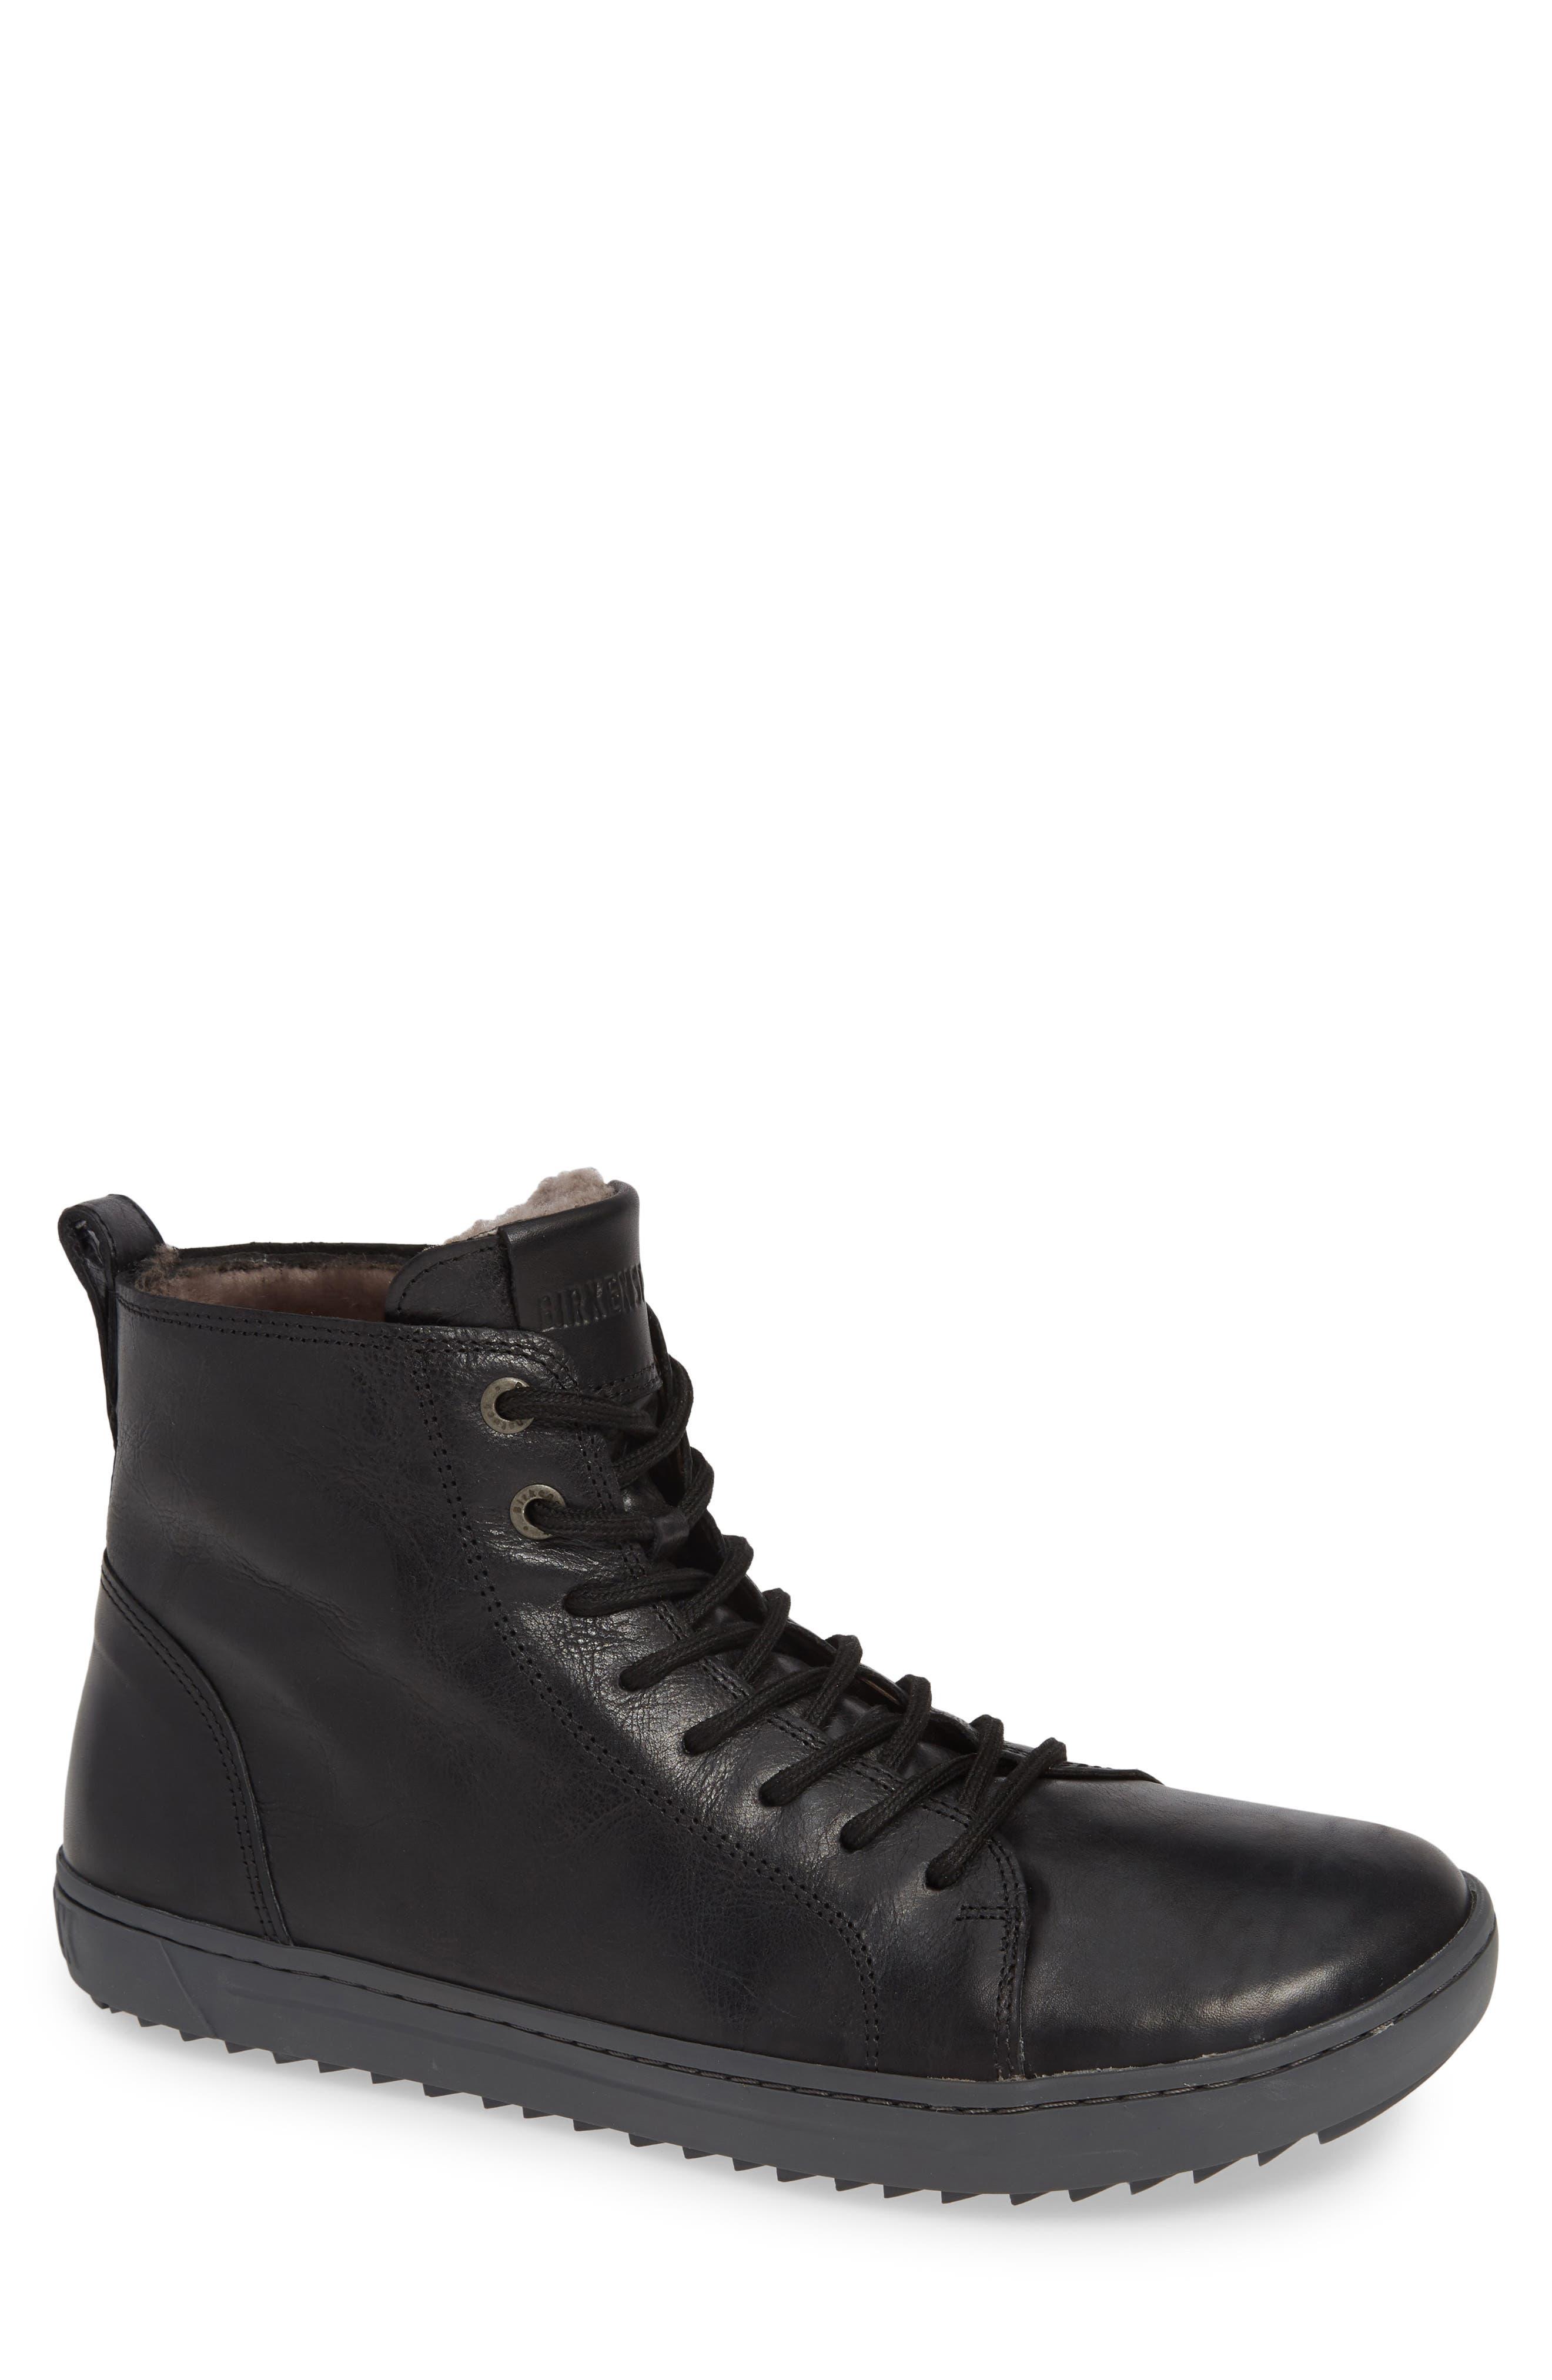 Birkenstock Barlett Genuine Shearling Sneaker,13.5 - Black